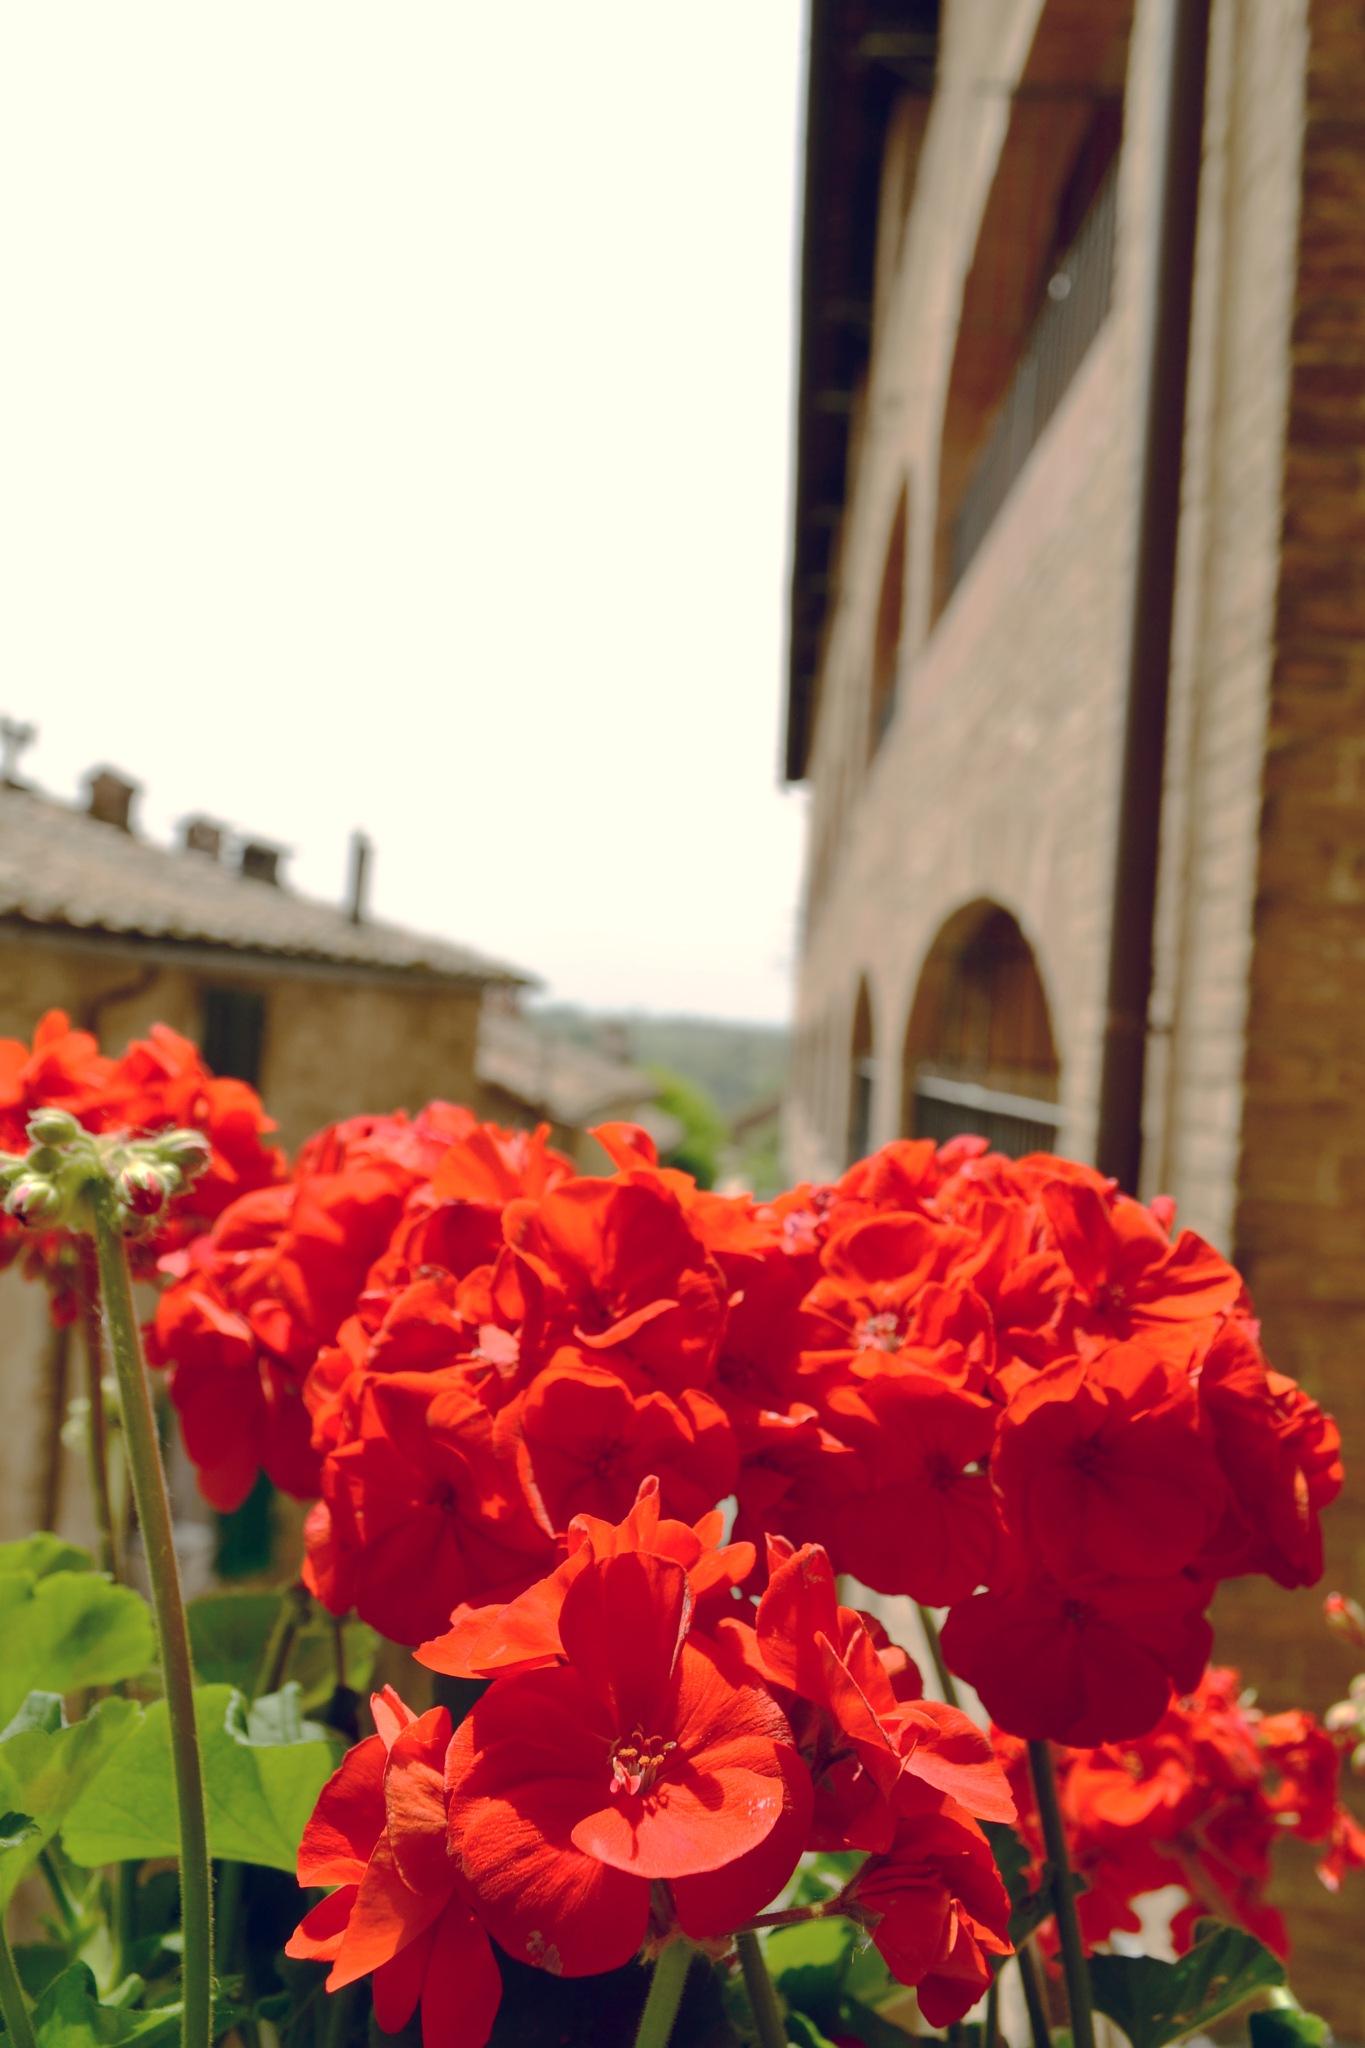 Siena, Italy by Jan Nieschulz